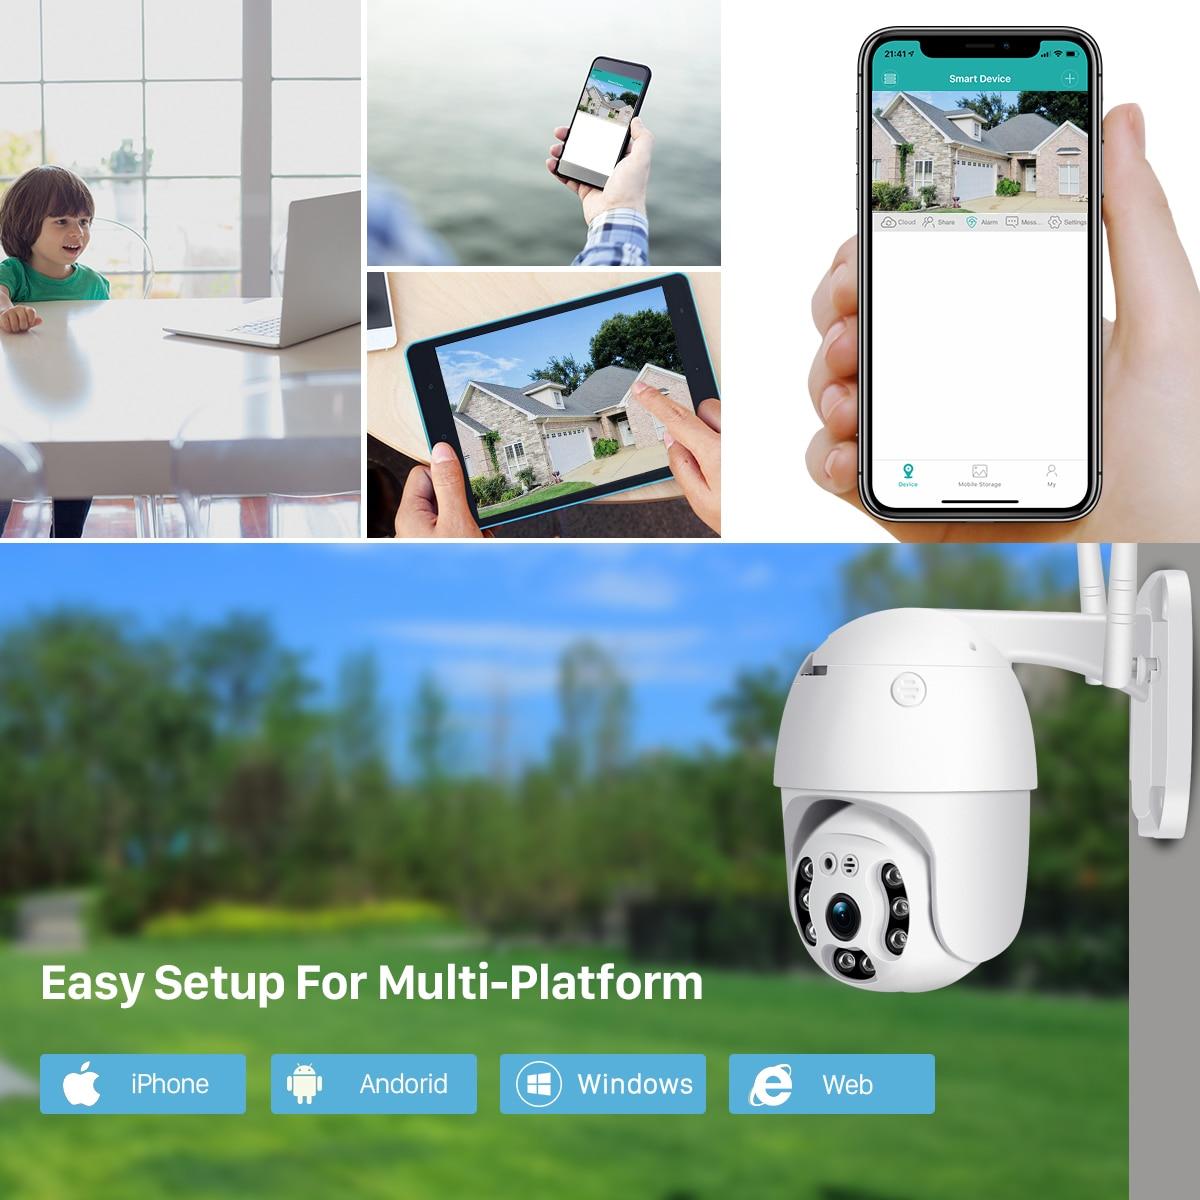 He5ce2552364d42d4b0e8fb3c85de160c0 BESDER H.265 PTZ IP Camera 2MP WiFi Cloud Storage Motion Voice Alert Dual Antenna Dual IR Light PTZ Security Surveillance Camera